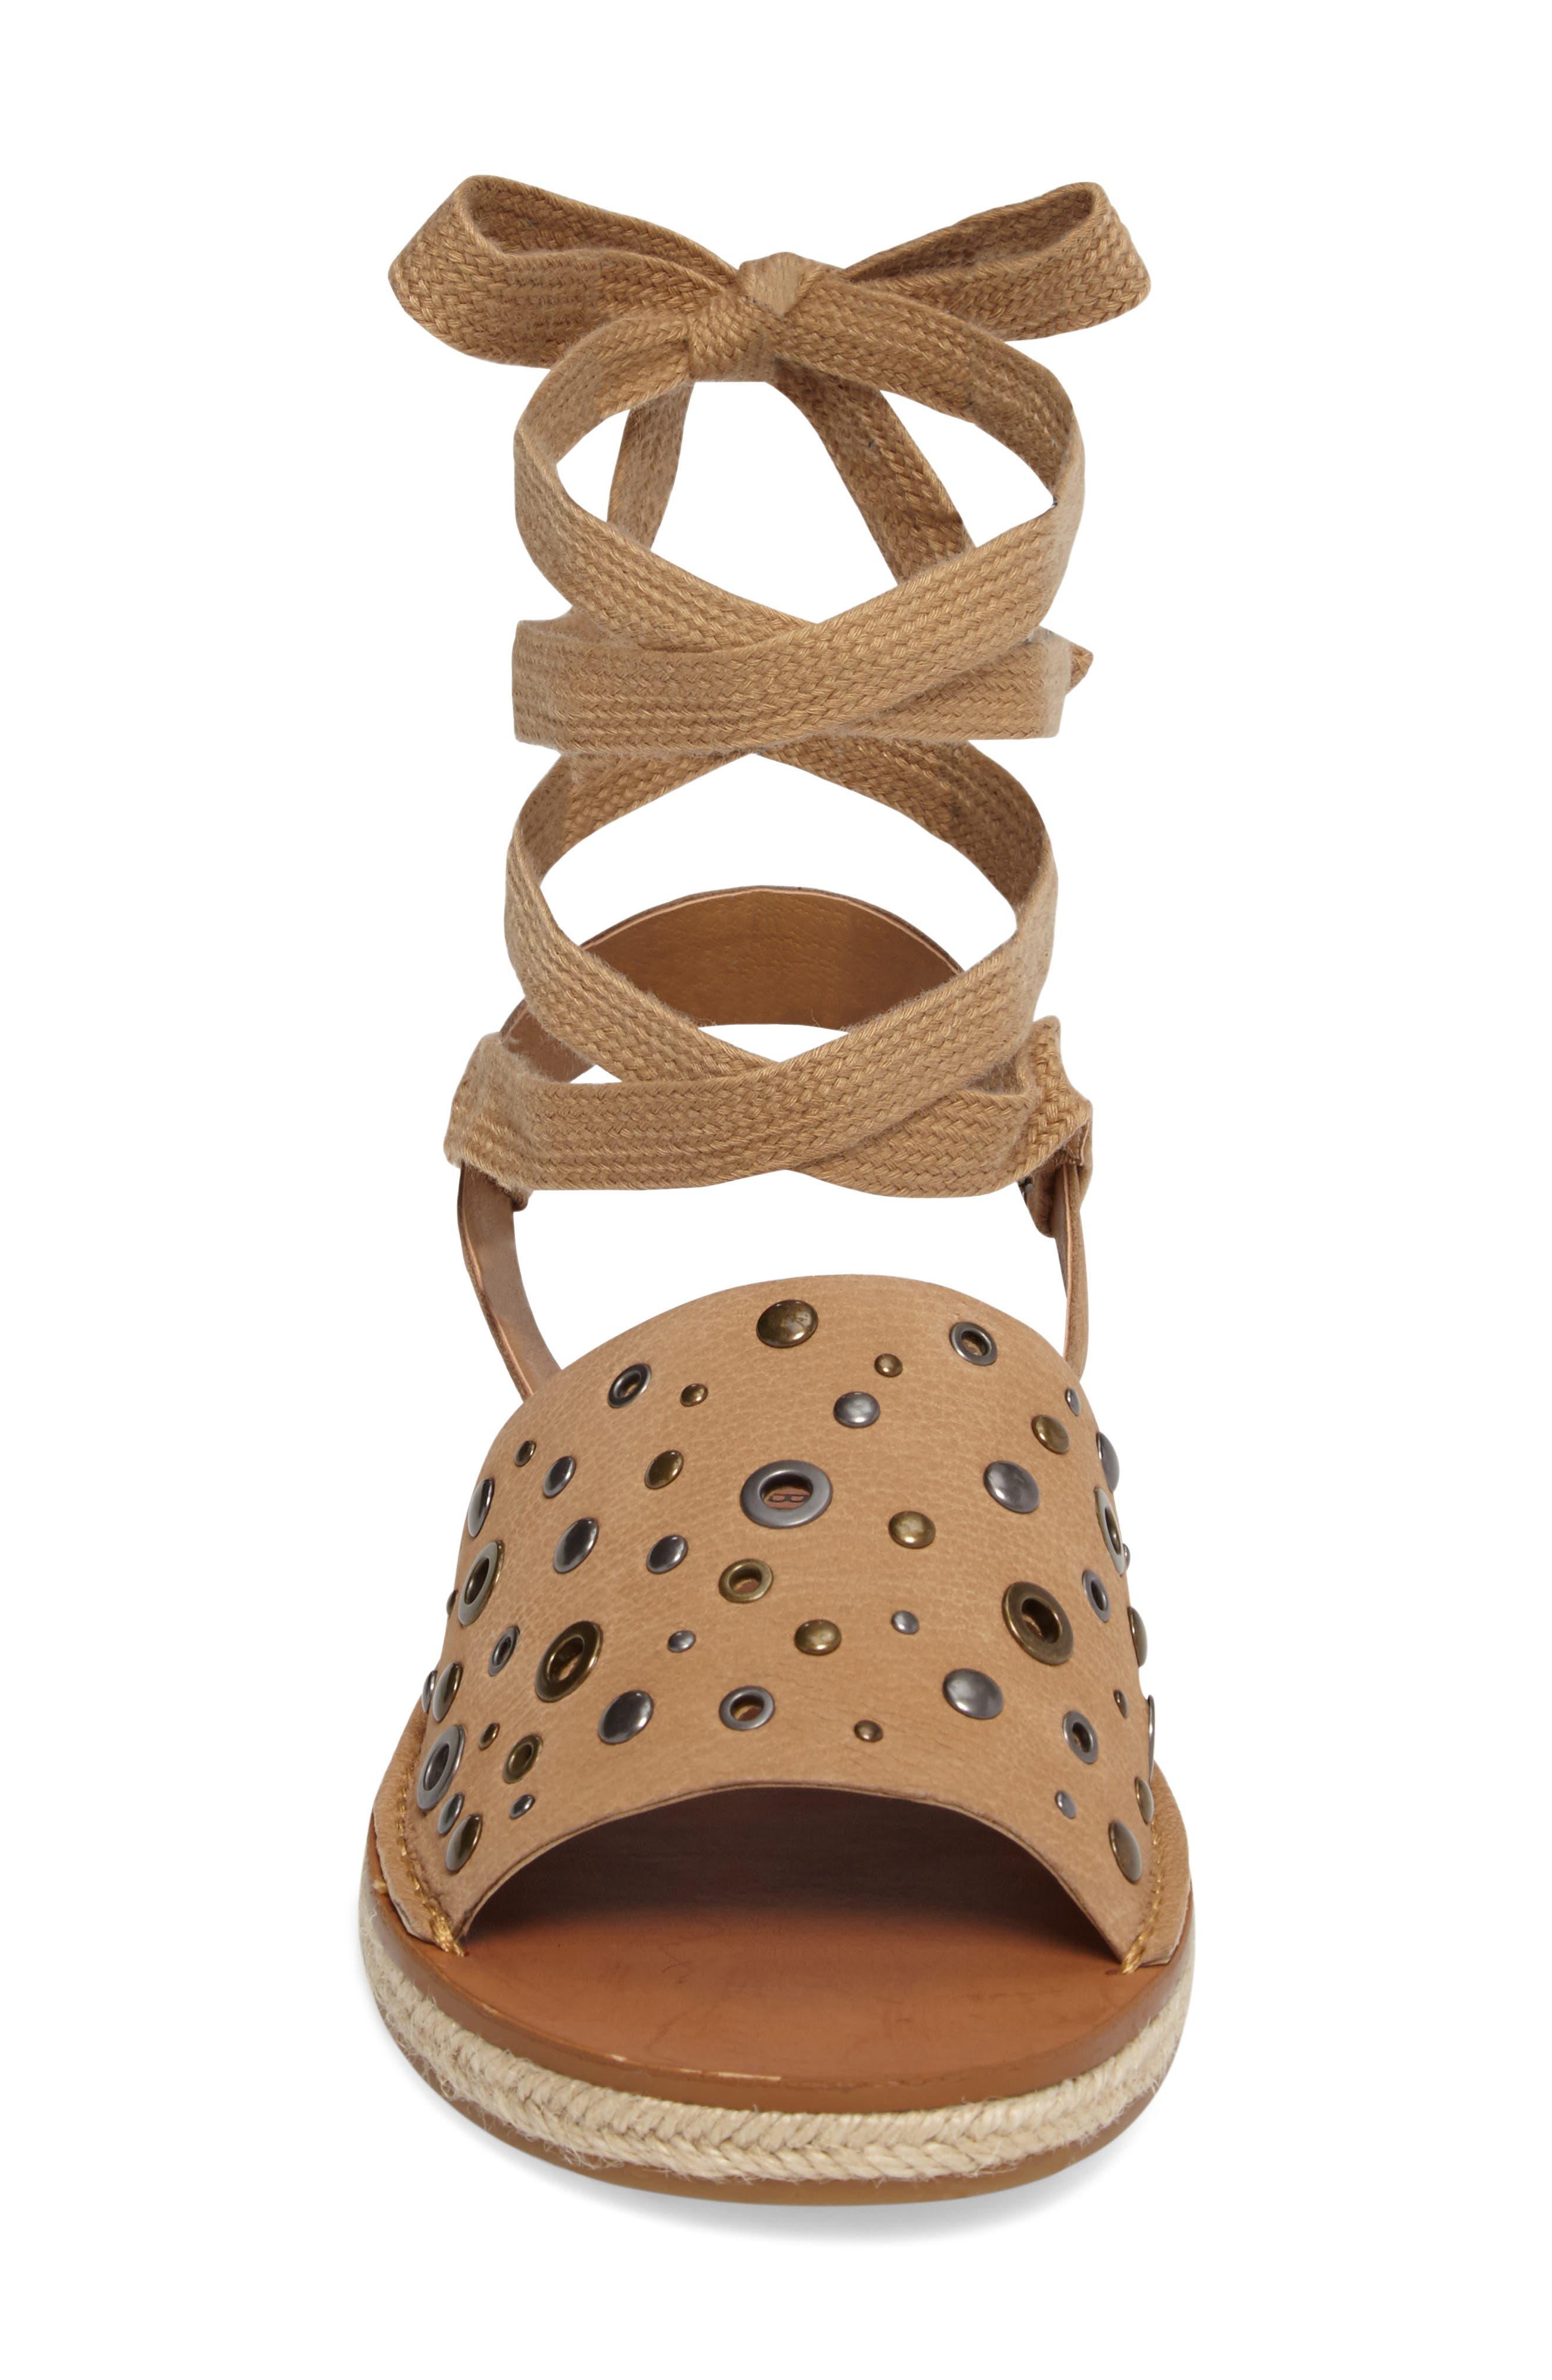 Daytah Ankle Tie Sandal,                             Alternate thumbnail 15, color,